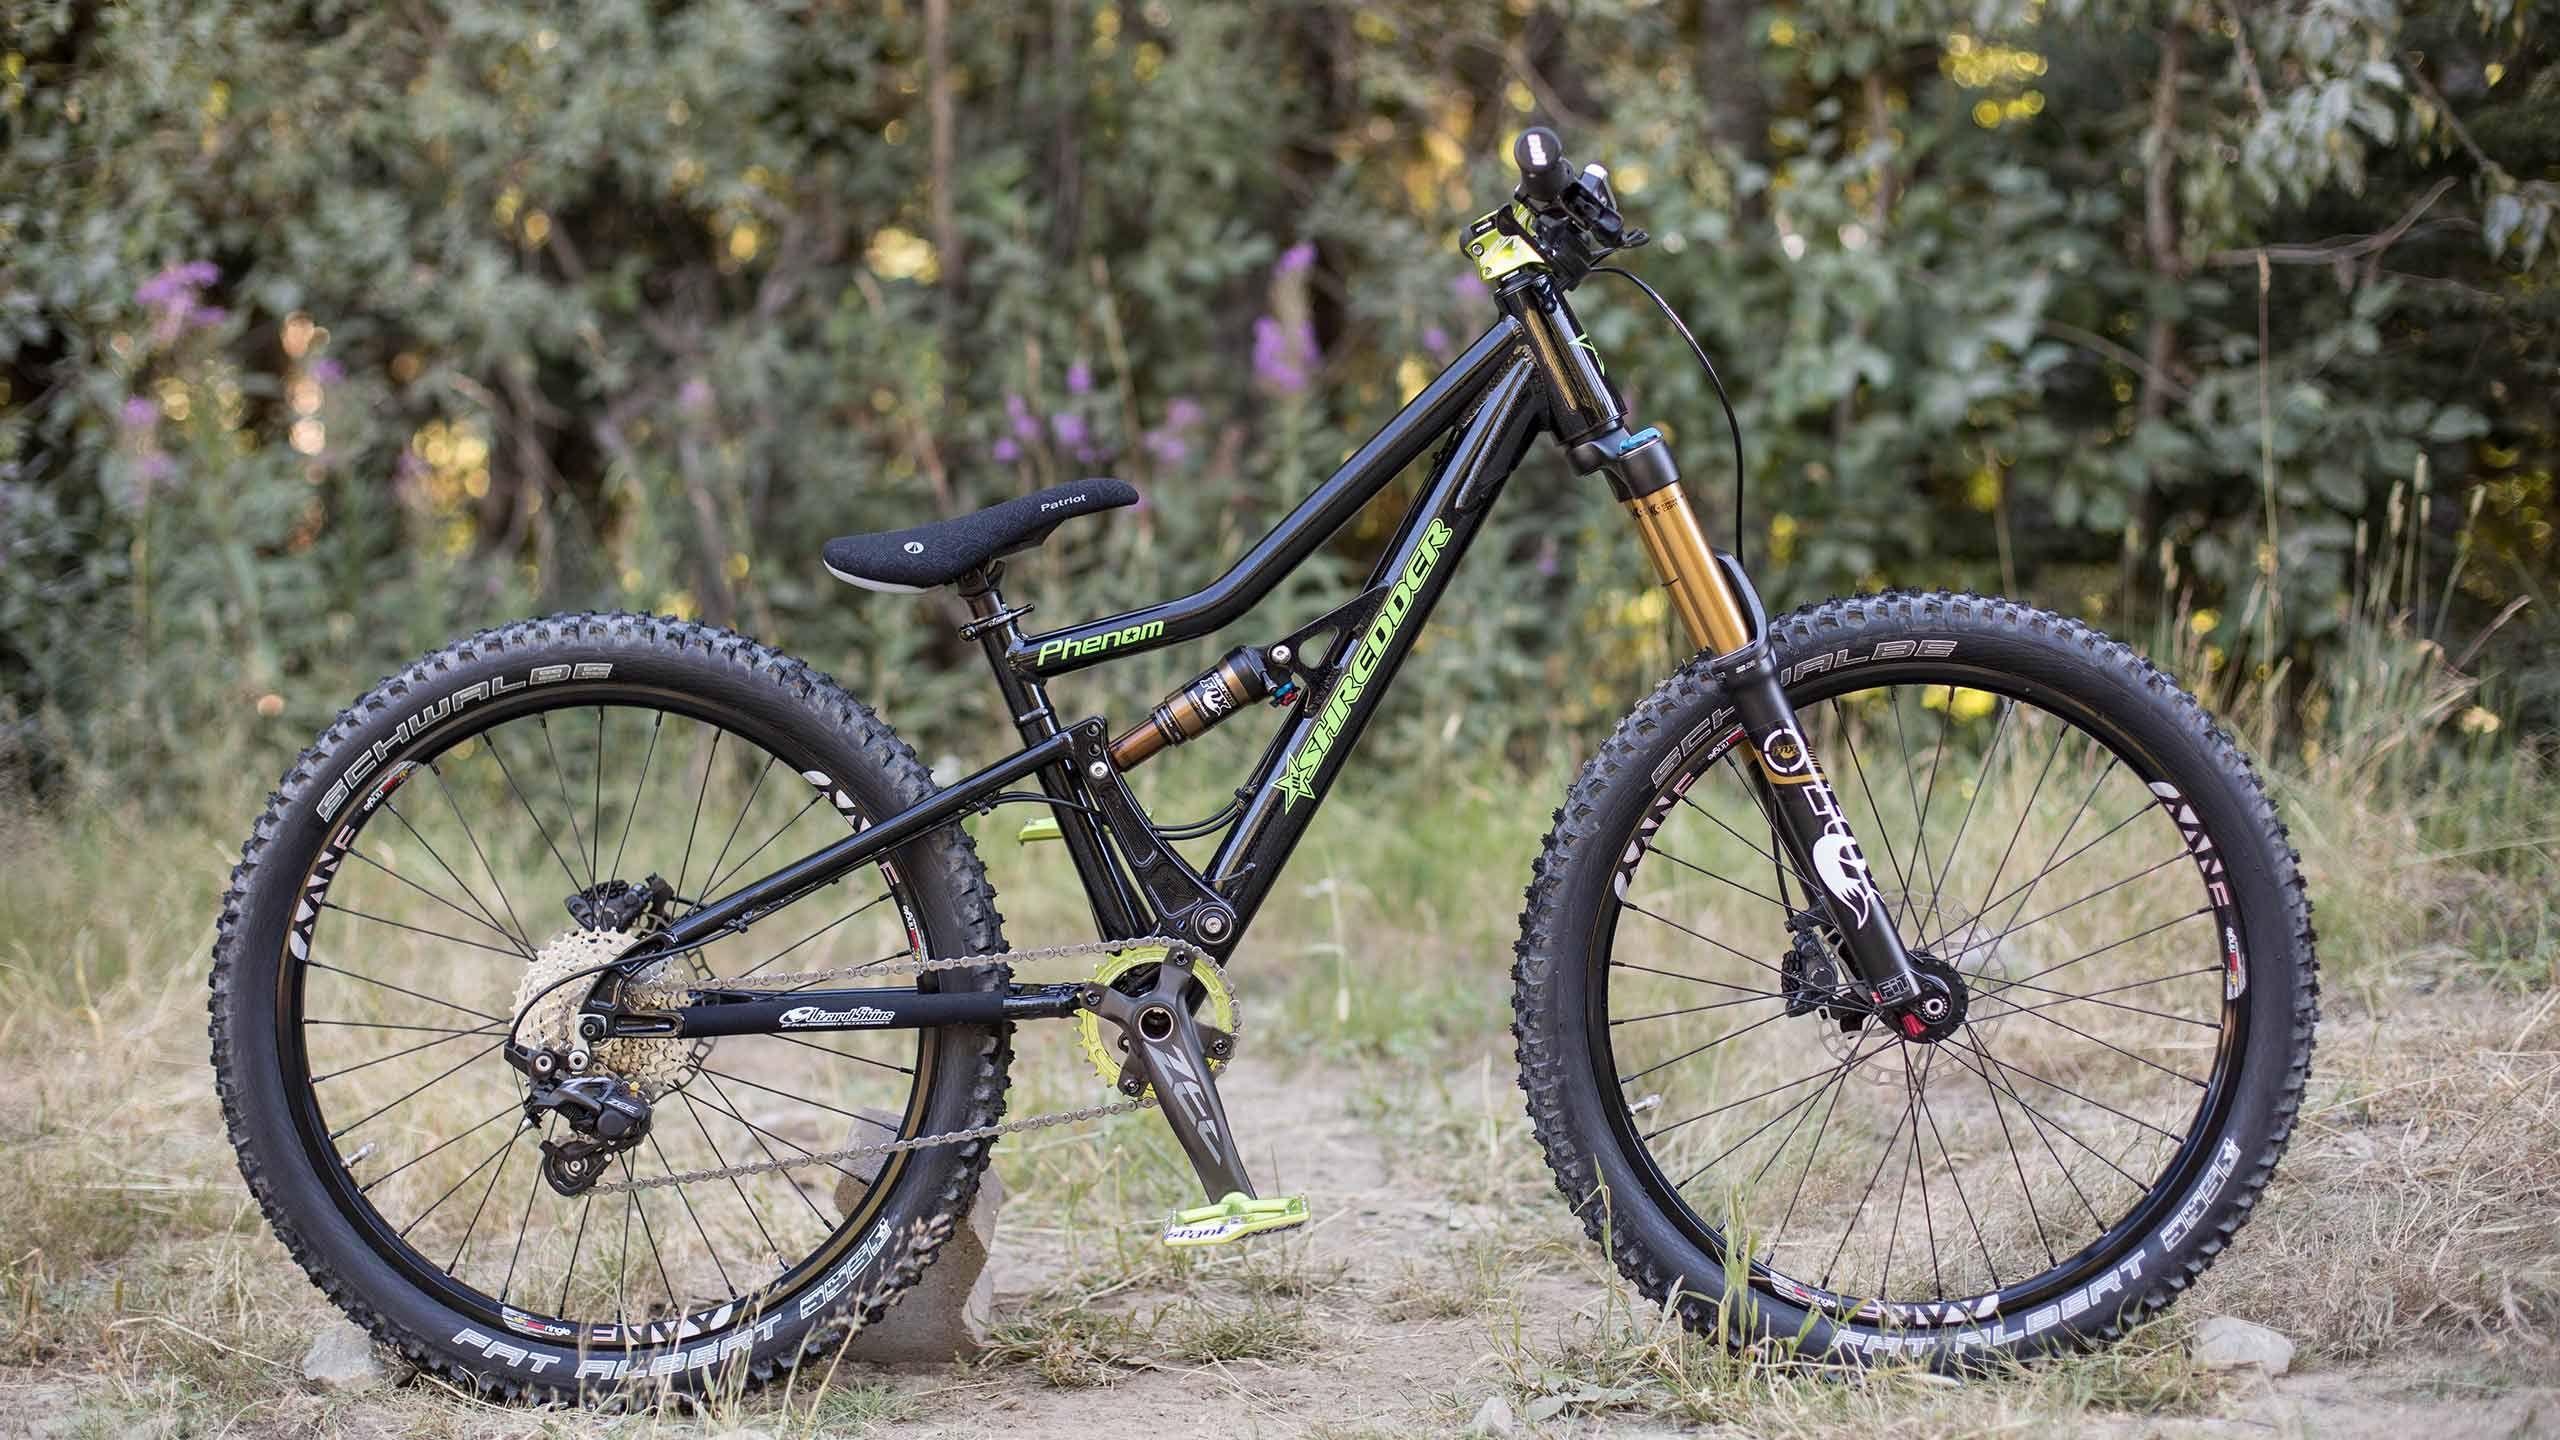 86cd9616081 Little Shredder Phenom, $1350, full suspension Kids Mountain Bikes, Mountain  Biking, Cycling